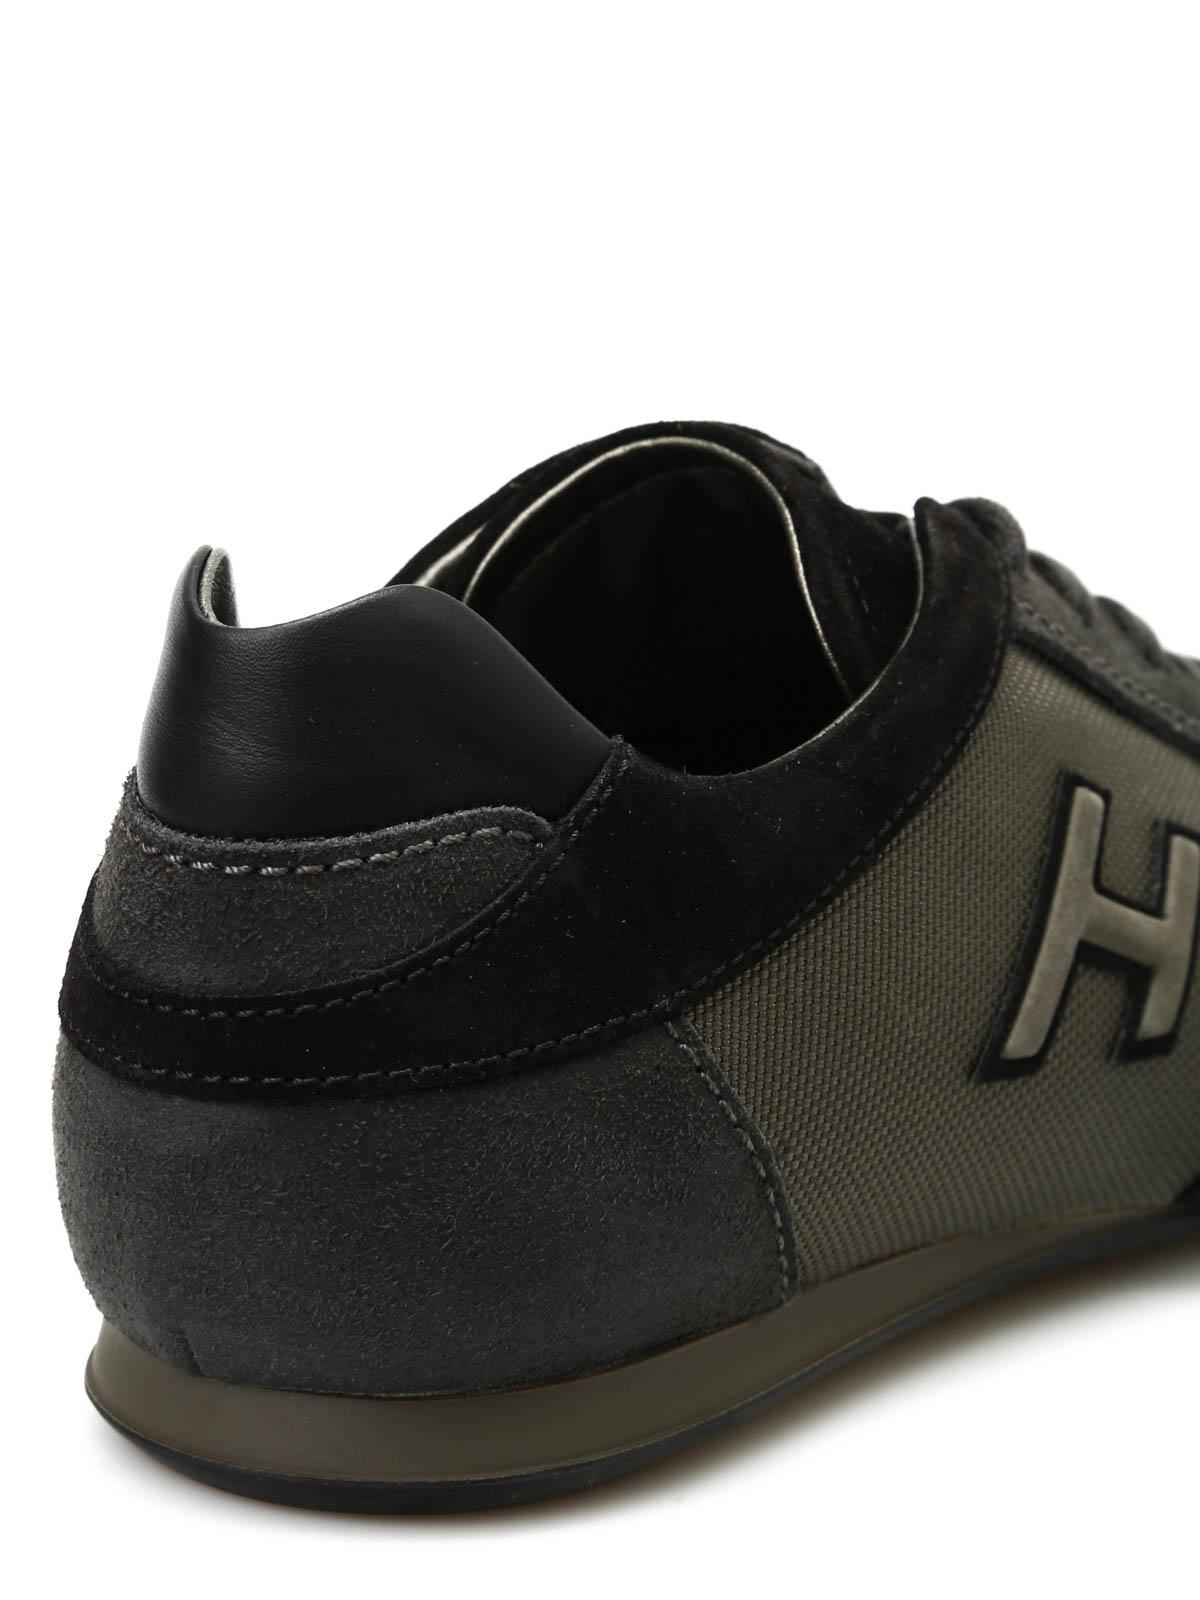 Trainers Hogan - Olympia slash H flock sneakers - HXM05701682E1M209V